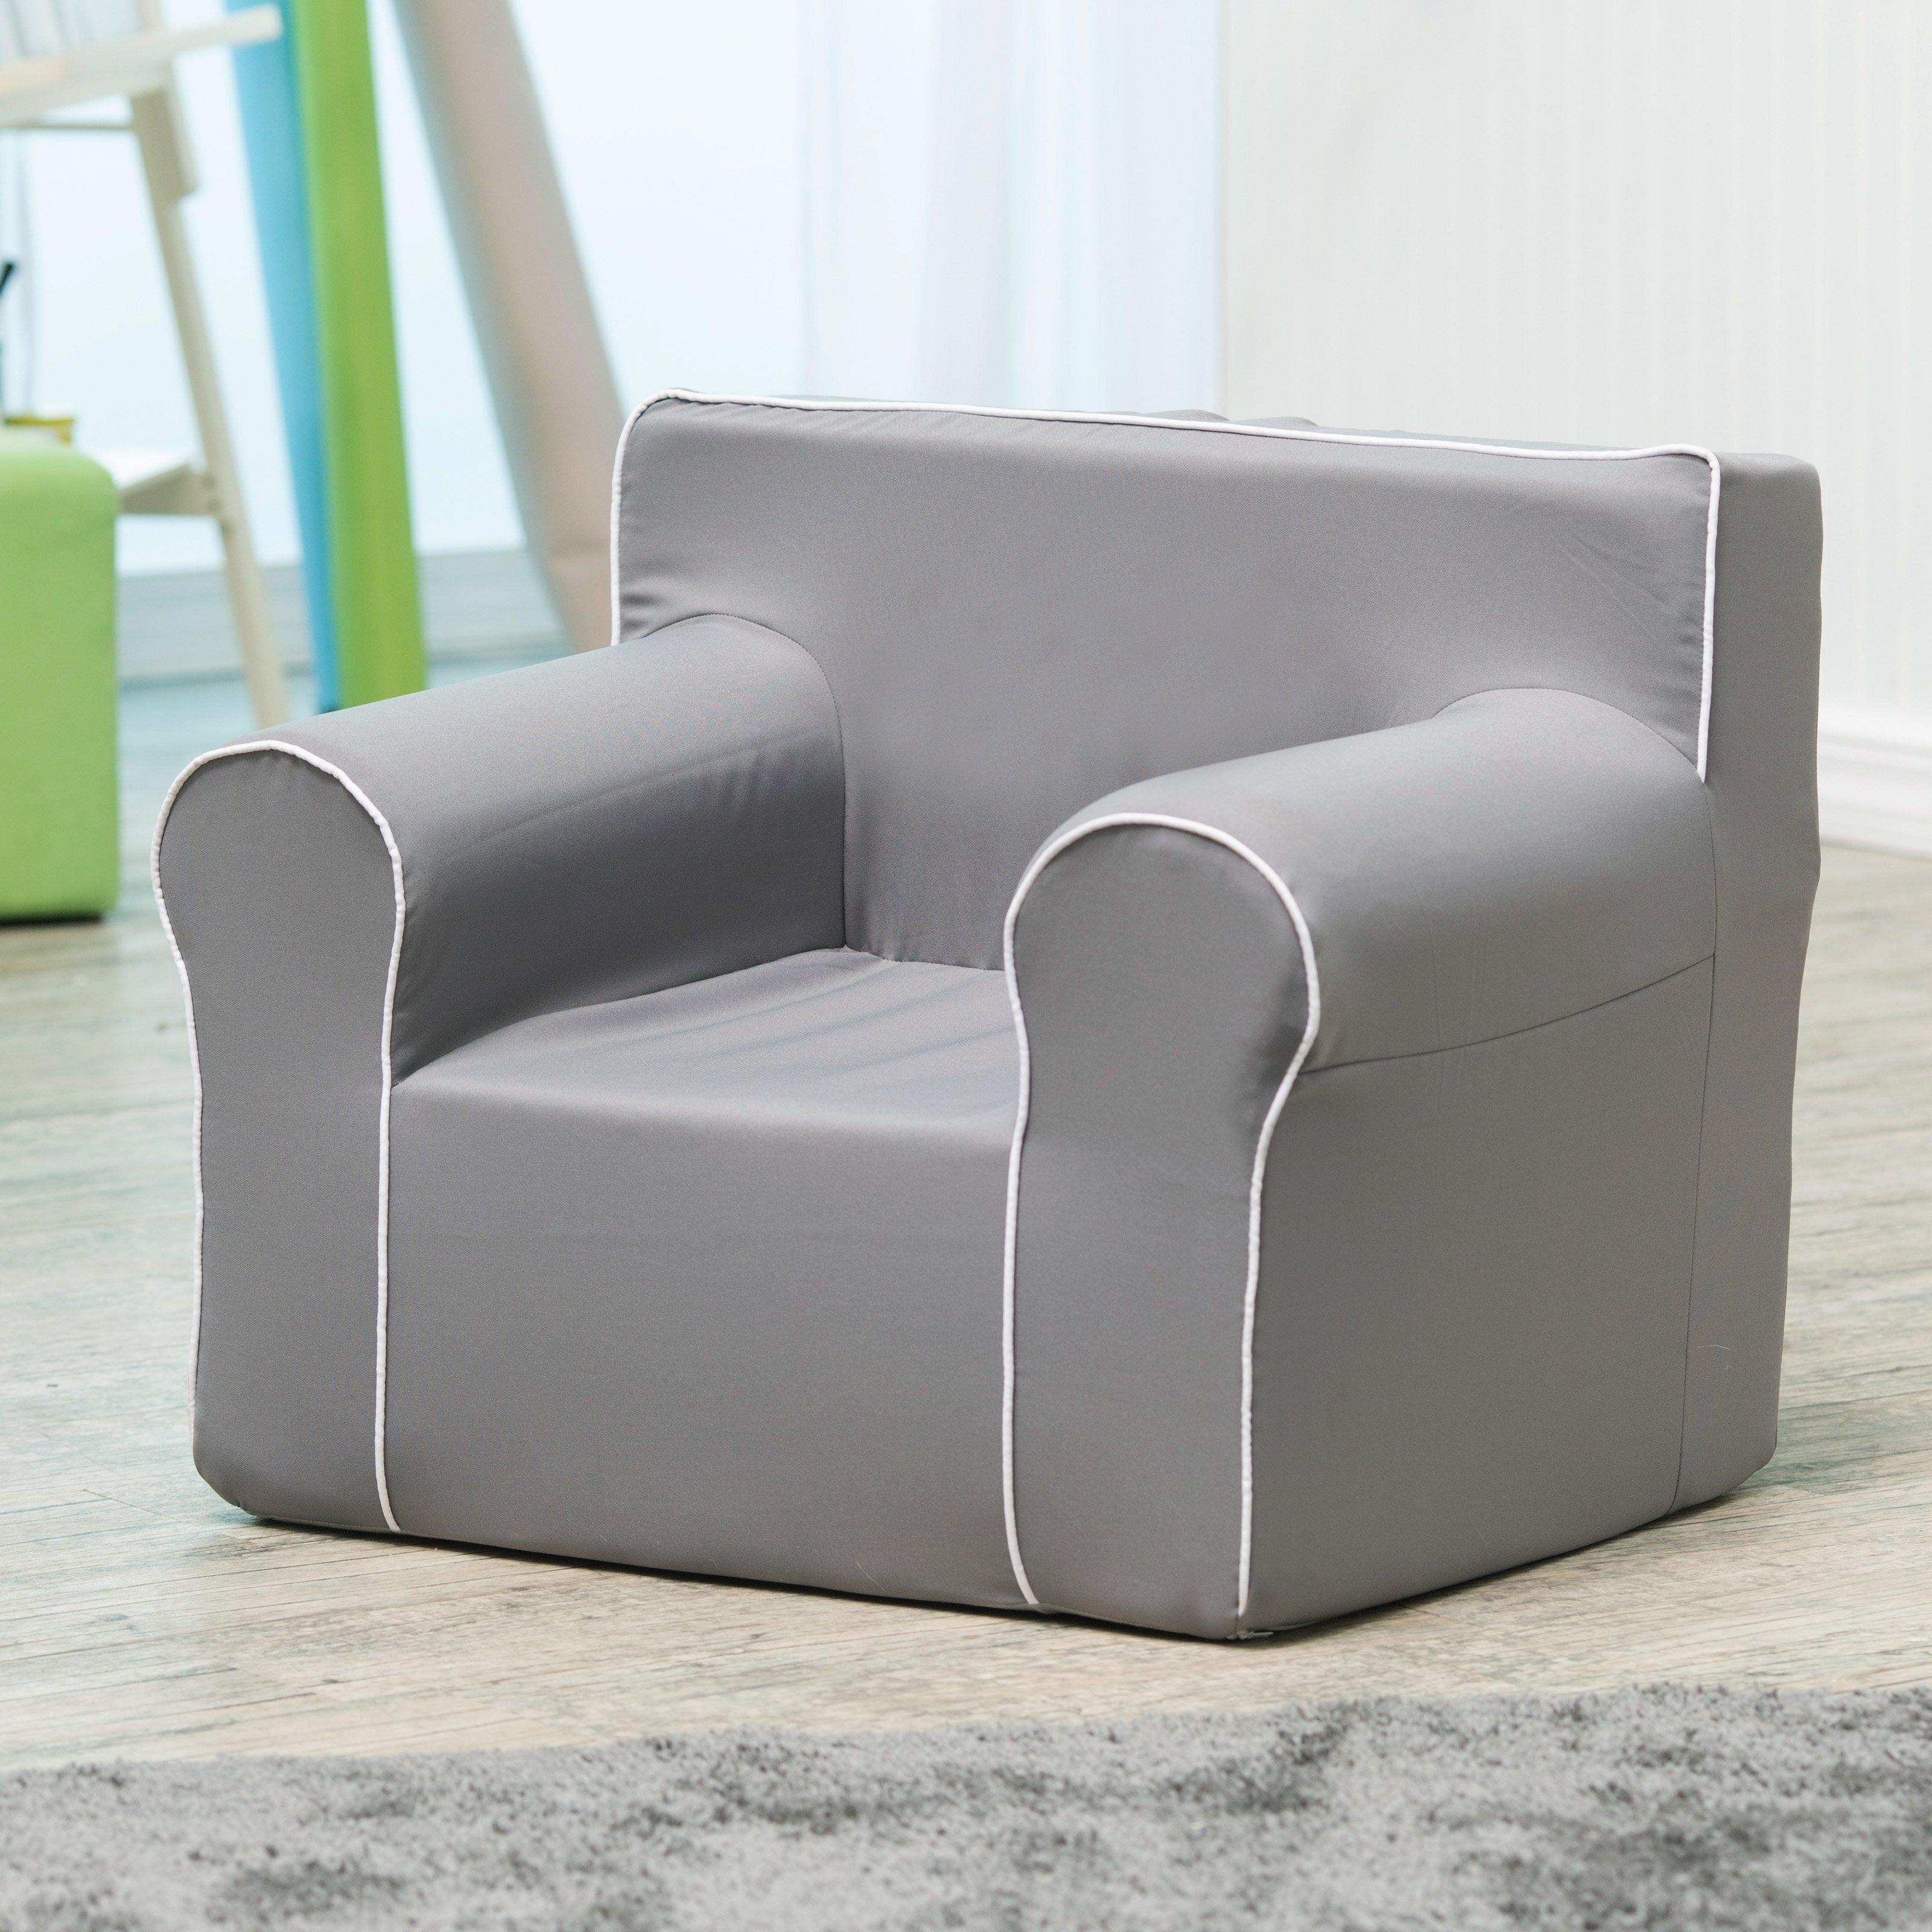 Superb 2019 Popular Personalized Kids Chairs And Sofas Creativecarmelina Interior Chair Design Creativecarmelinacom